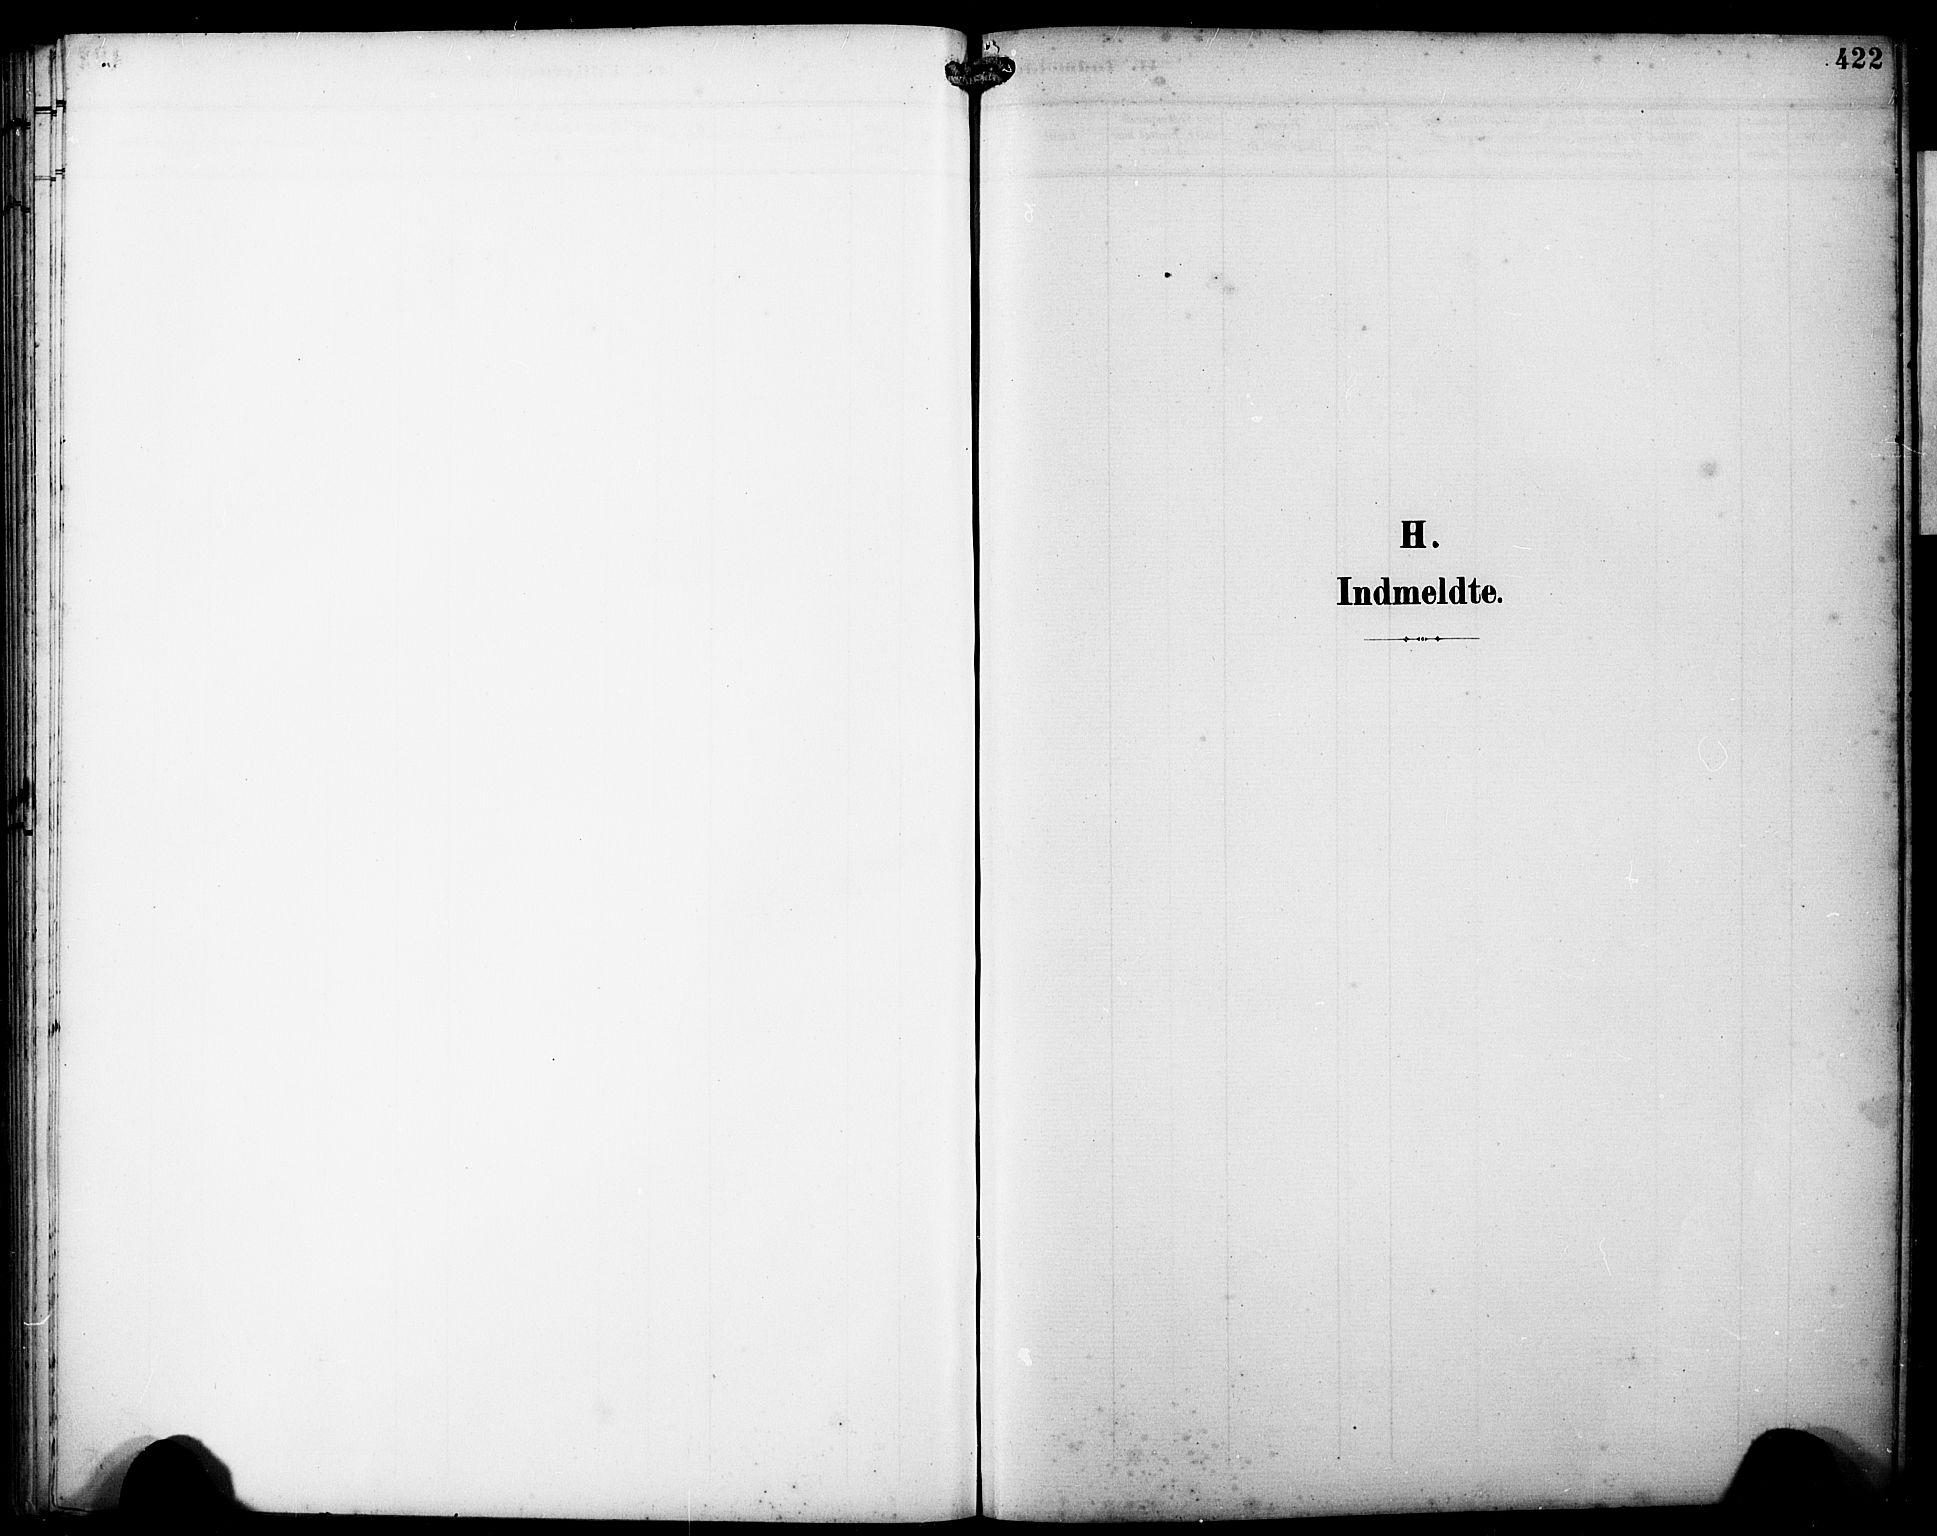 SAB, Fjell sokneprestembete, H/Hab: Klokkerbok nr. A 5, 1899-1918, s. 422